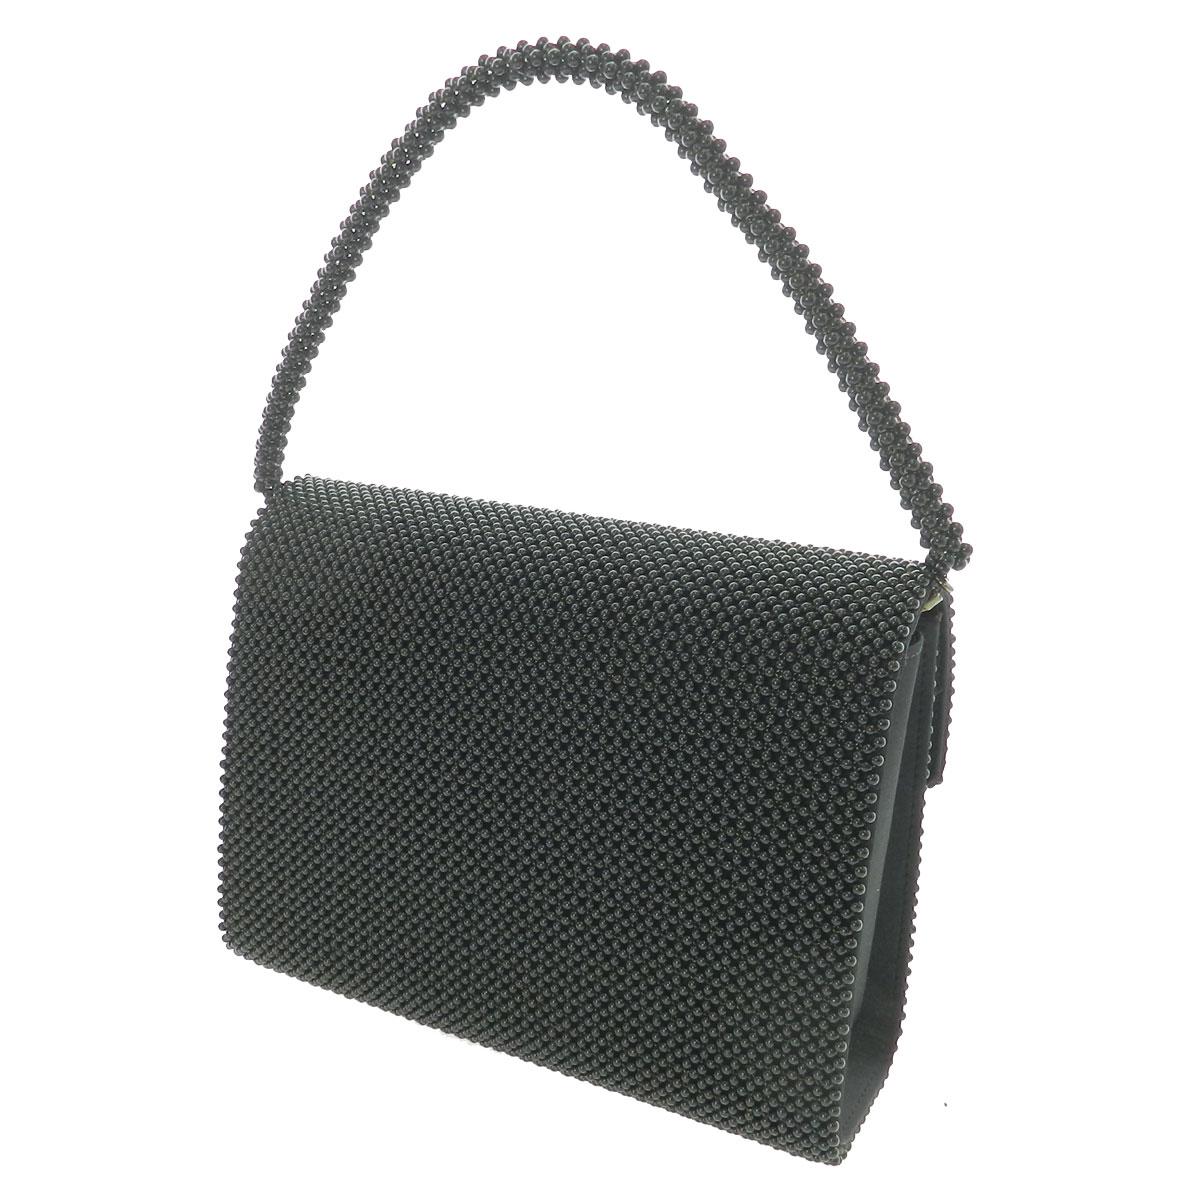 Yukiko Kimijima黑珊瑚正式2WAY包手提包黑珊瑚女士